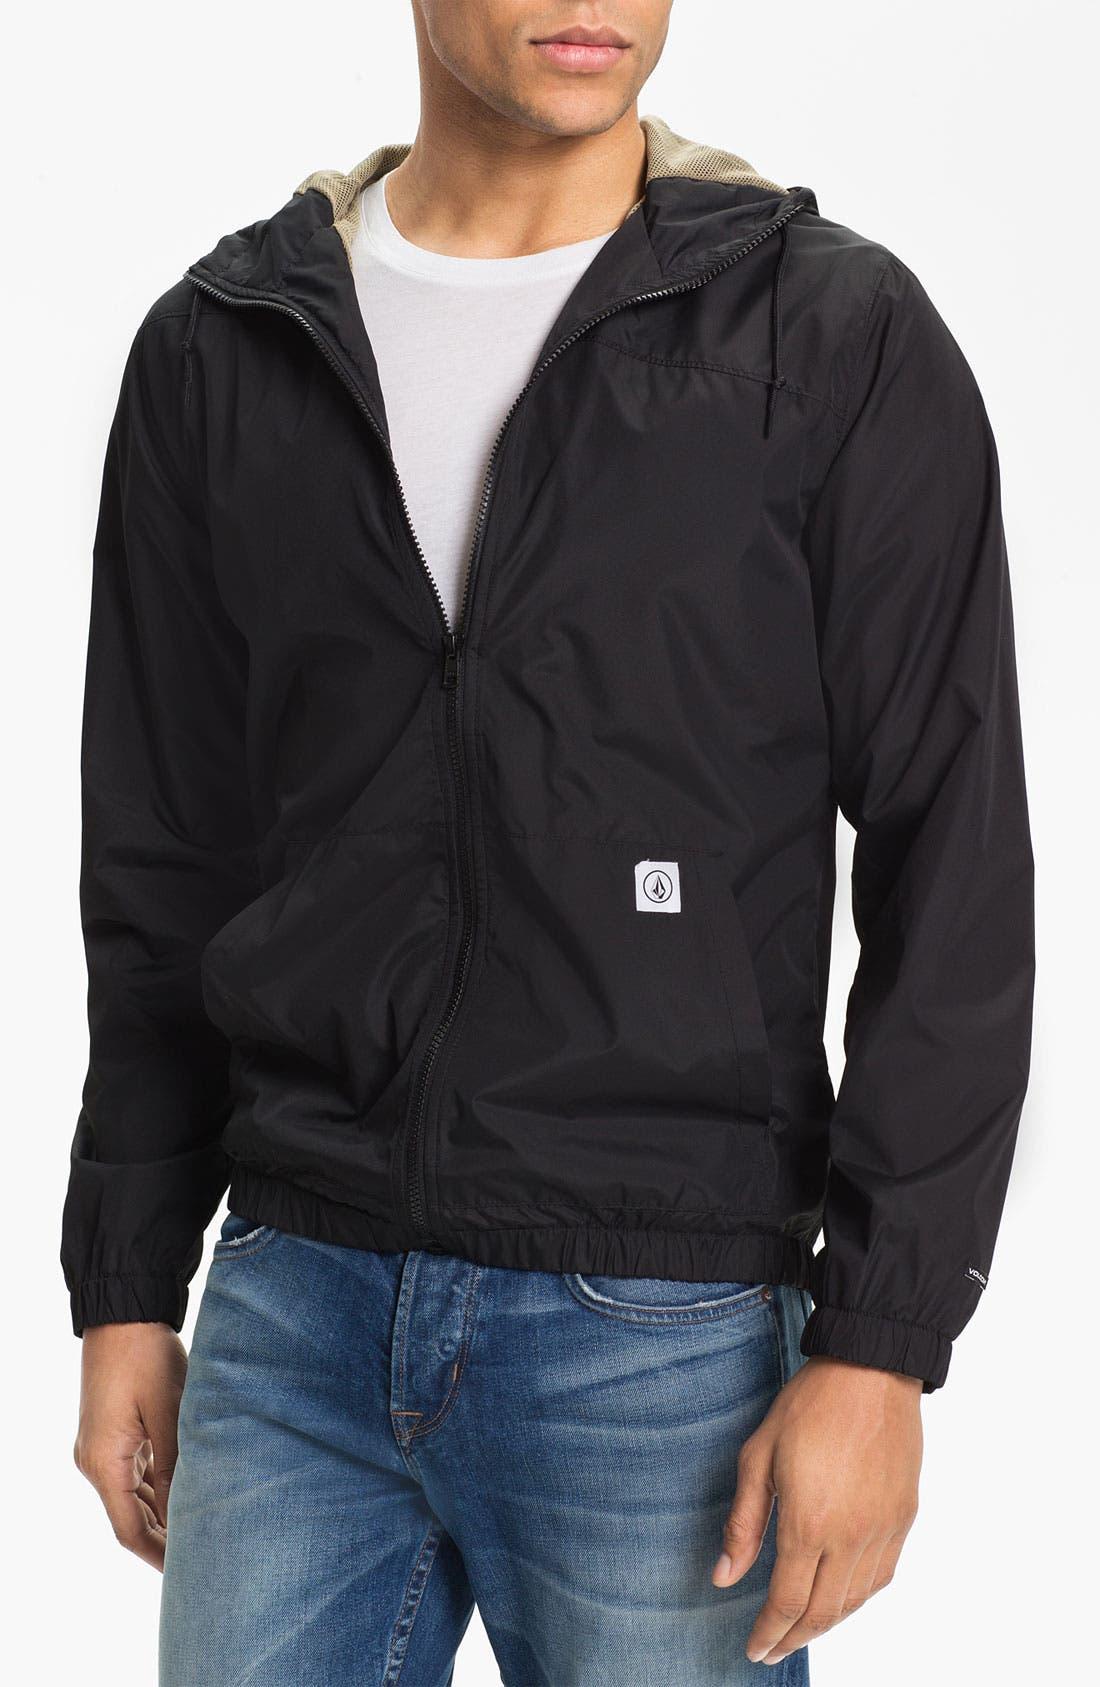 Main Image - Volcom 'Ringer' Windbreaker Jacket